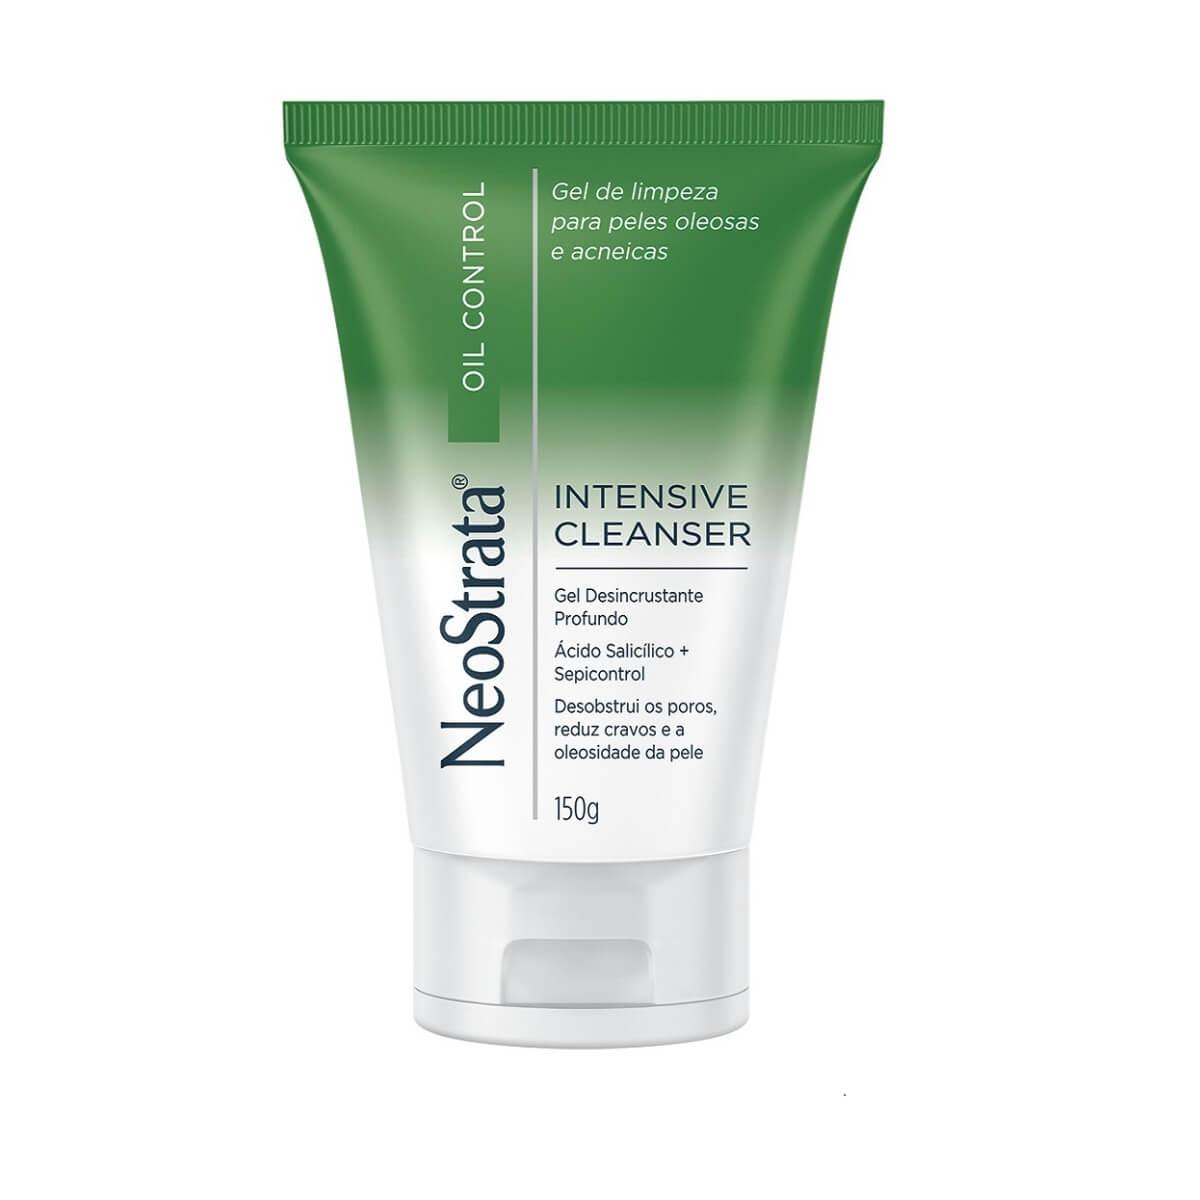 Gel de Limpeza NeoStrata Oil Control Intensive Cleanser com 150g 150g